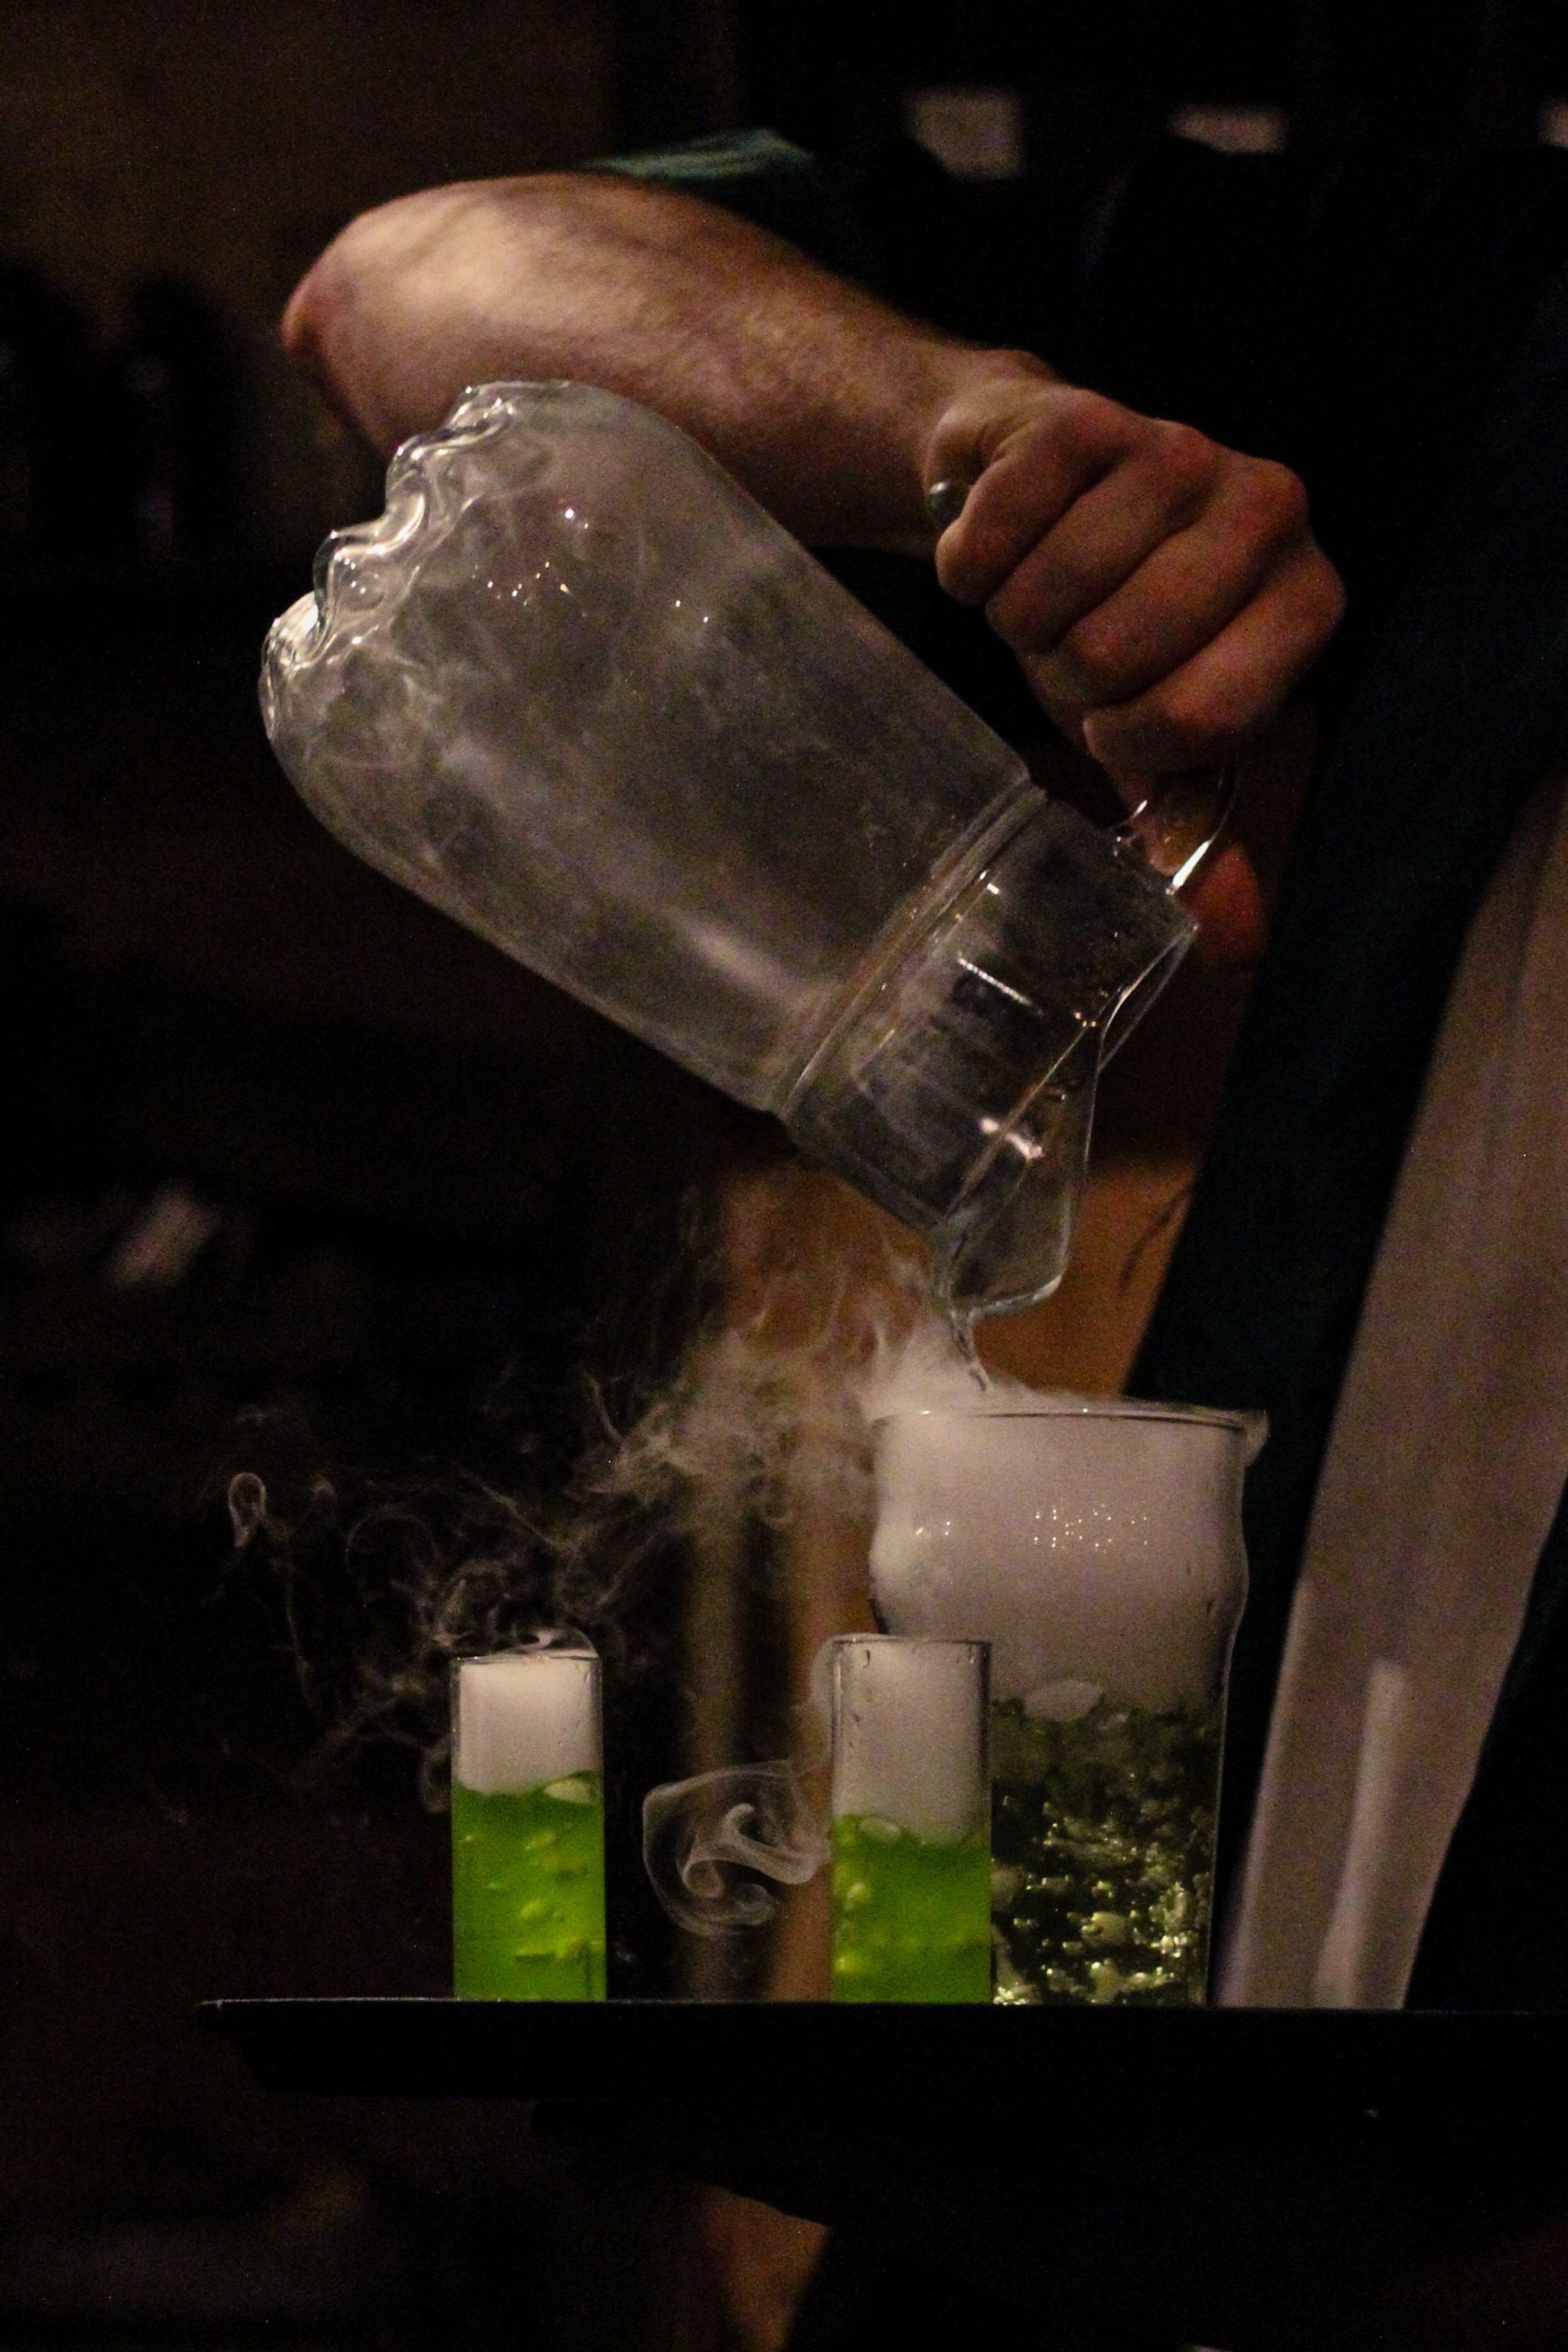 The-Cauldron-cocktail-making